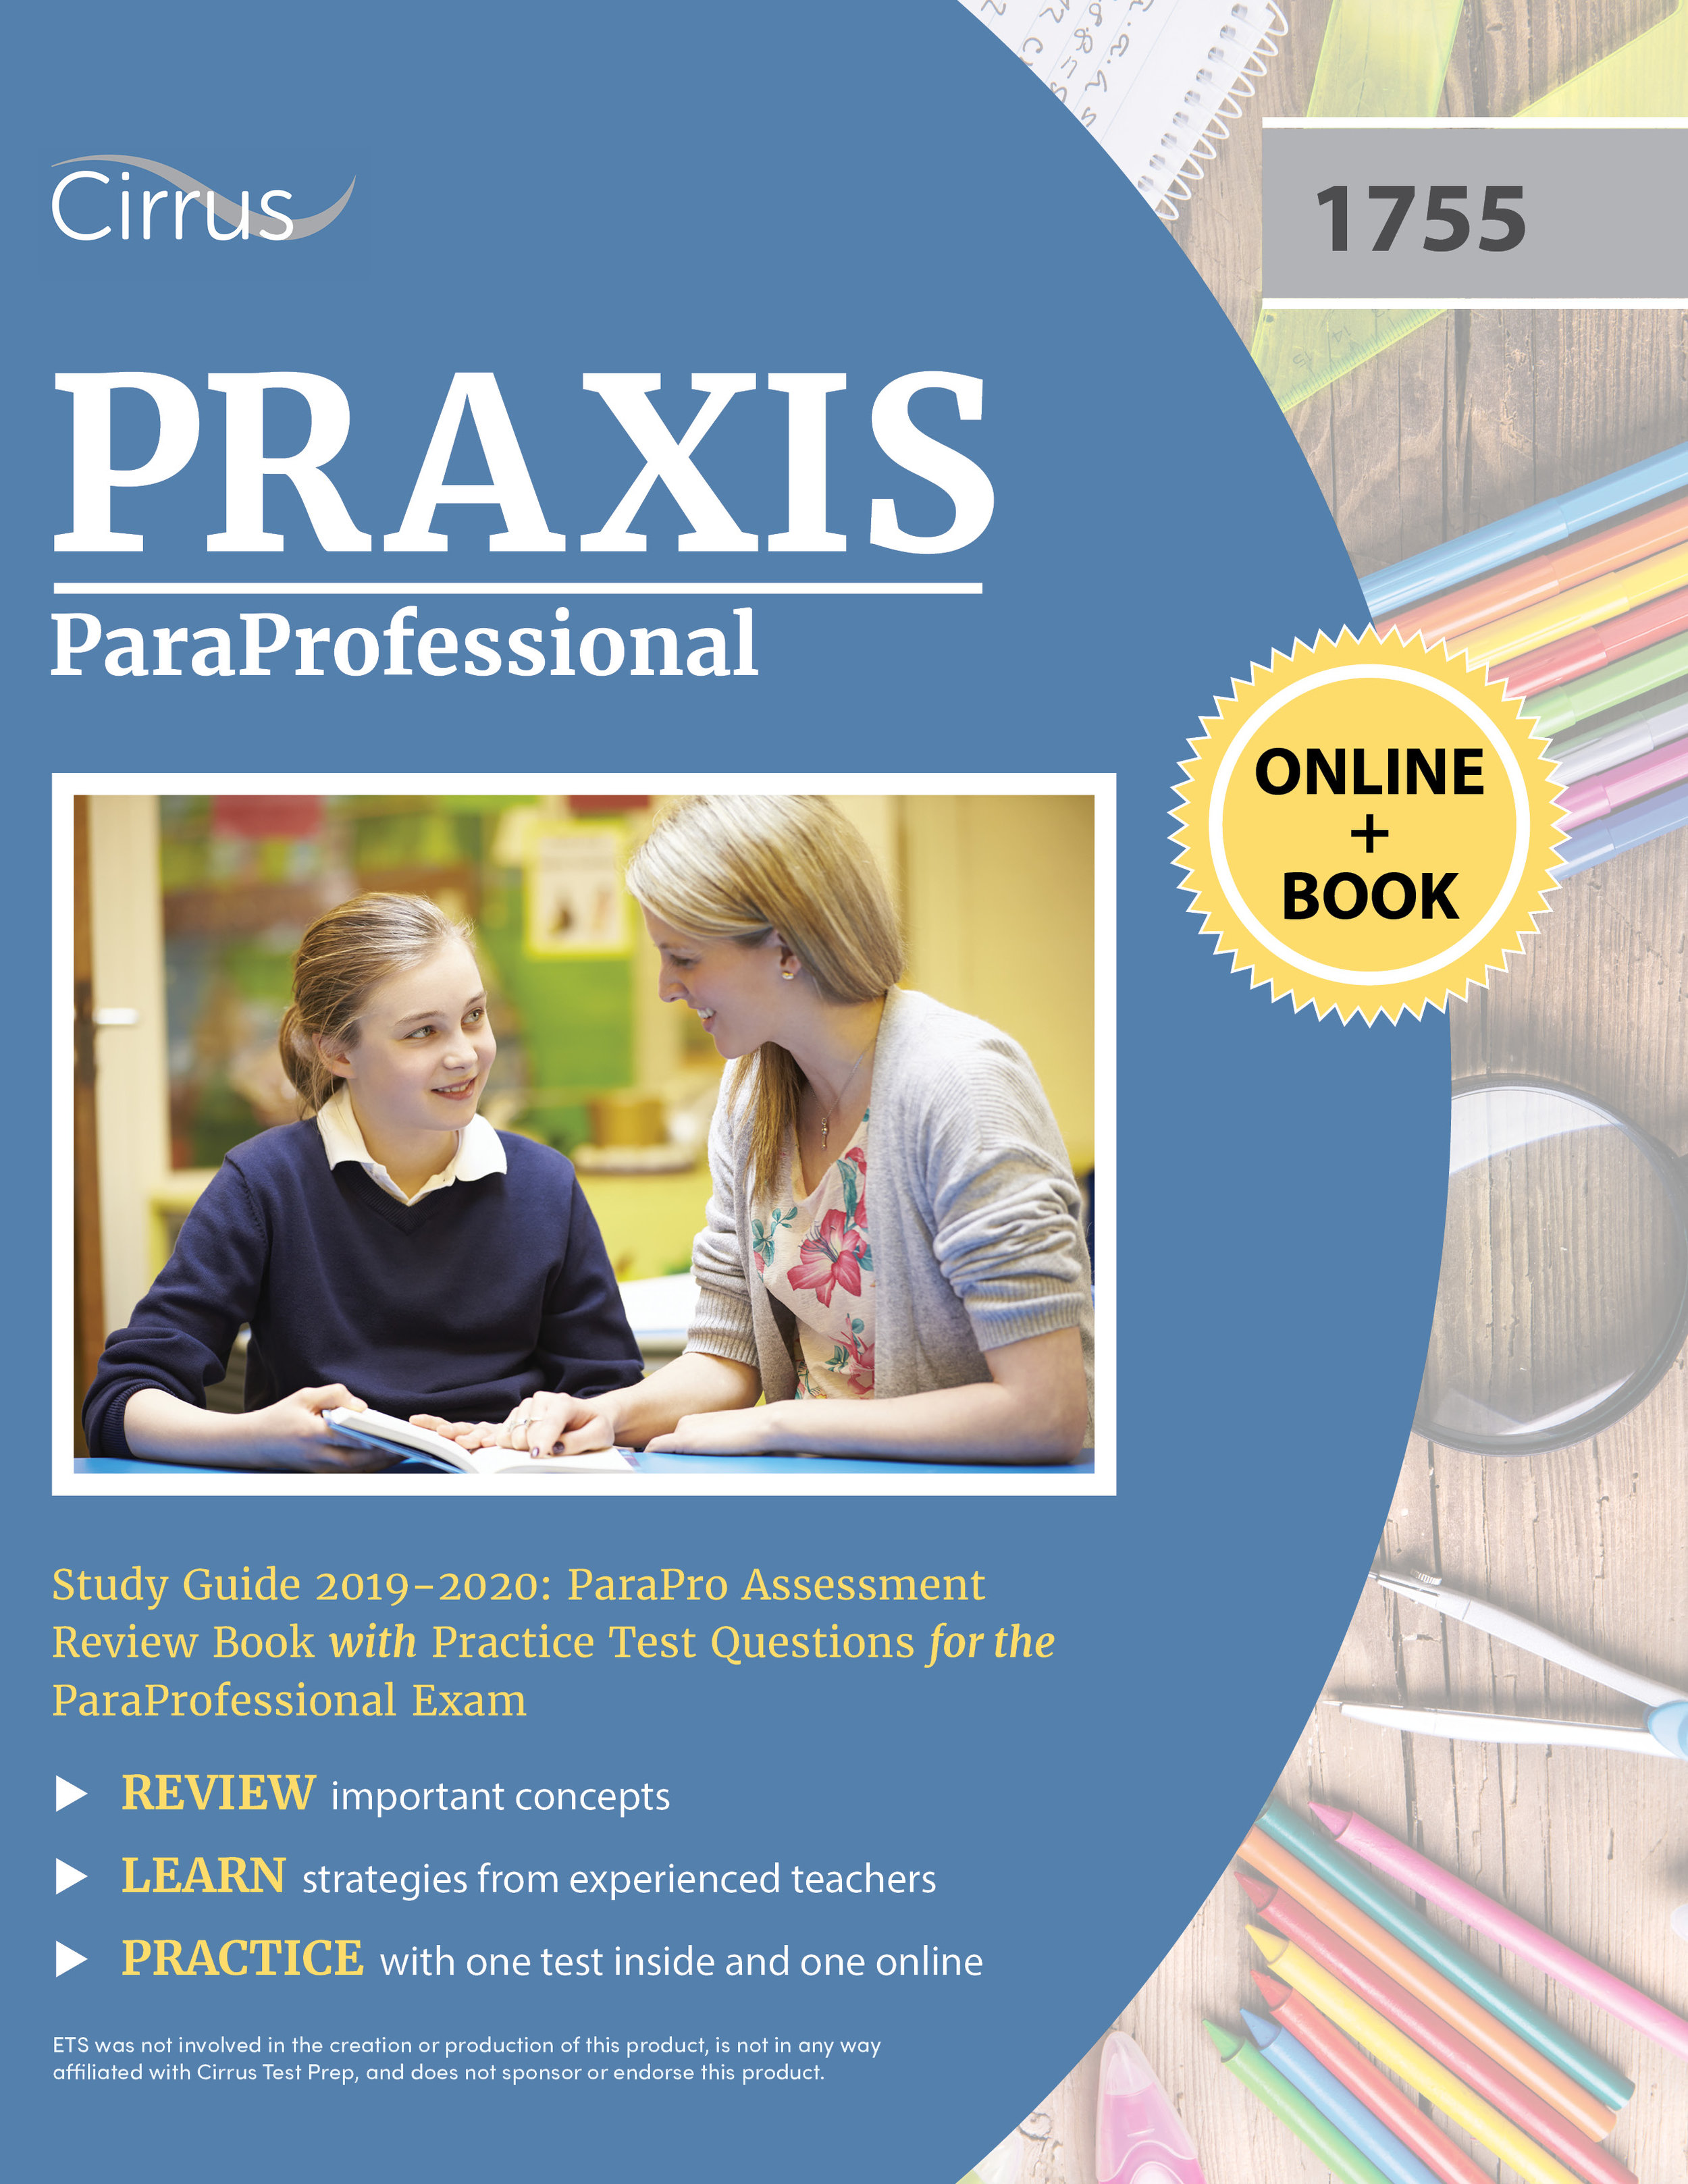 Praxis_parapro_cover_website.jpg